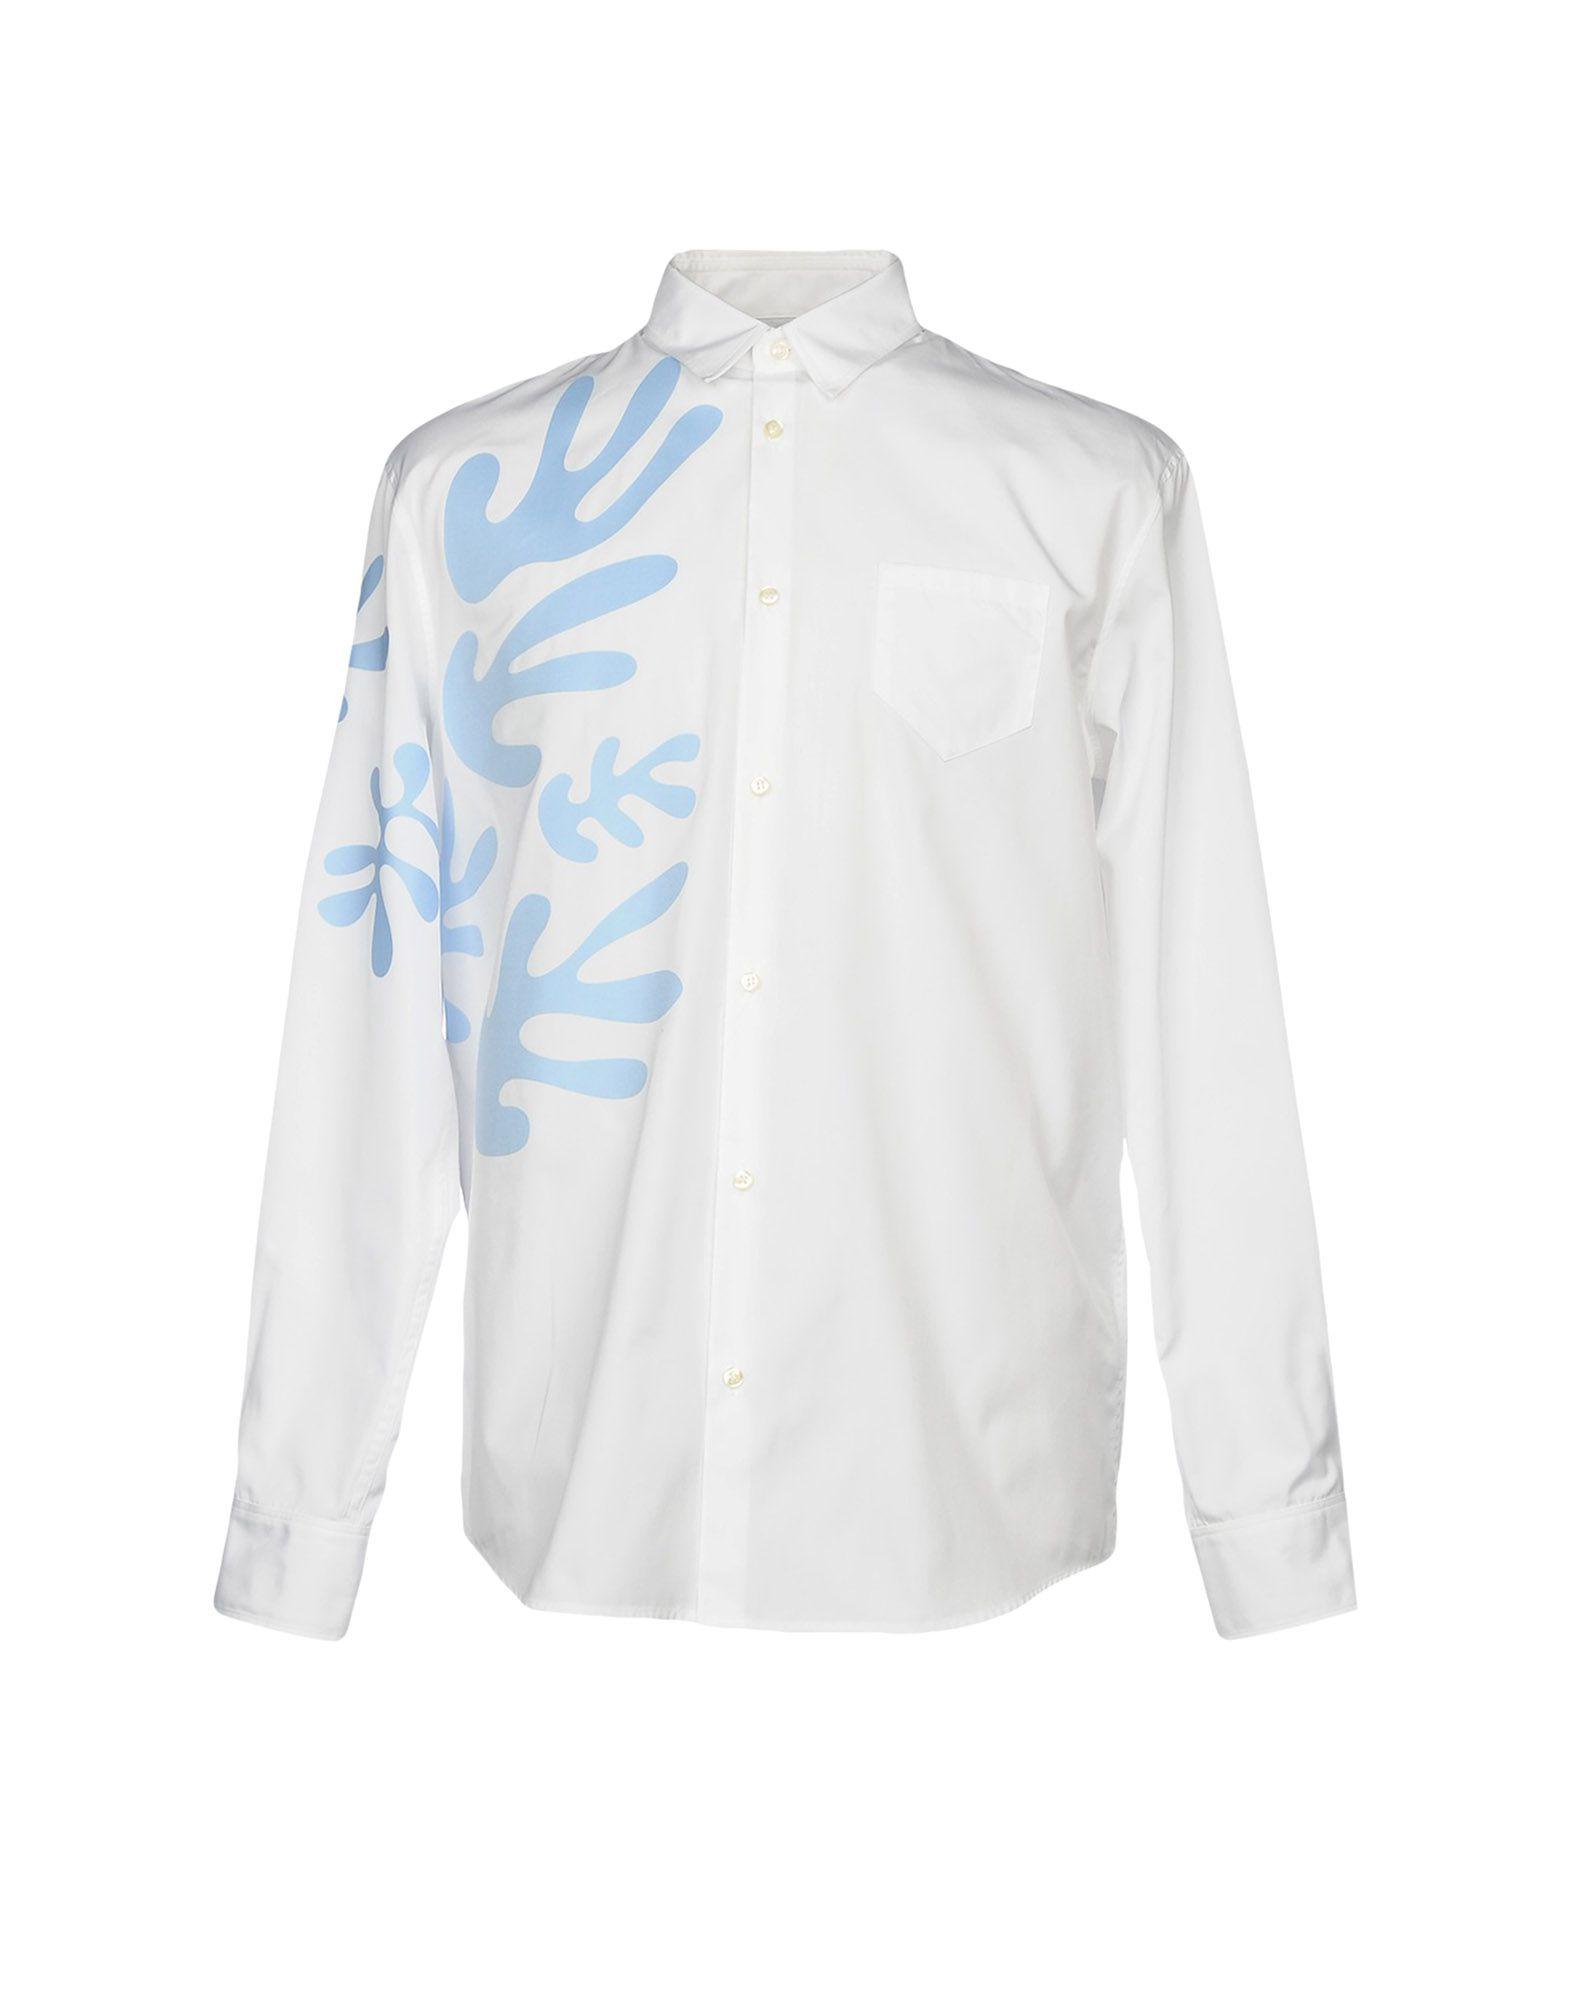 Camicia Tinta Unita Dsquarosso2 Uomo Uomo Dsquarosso2 - 38721043SX a820a4